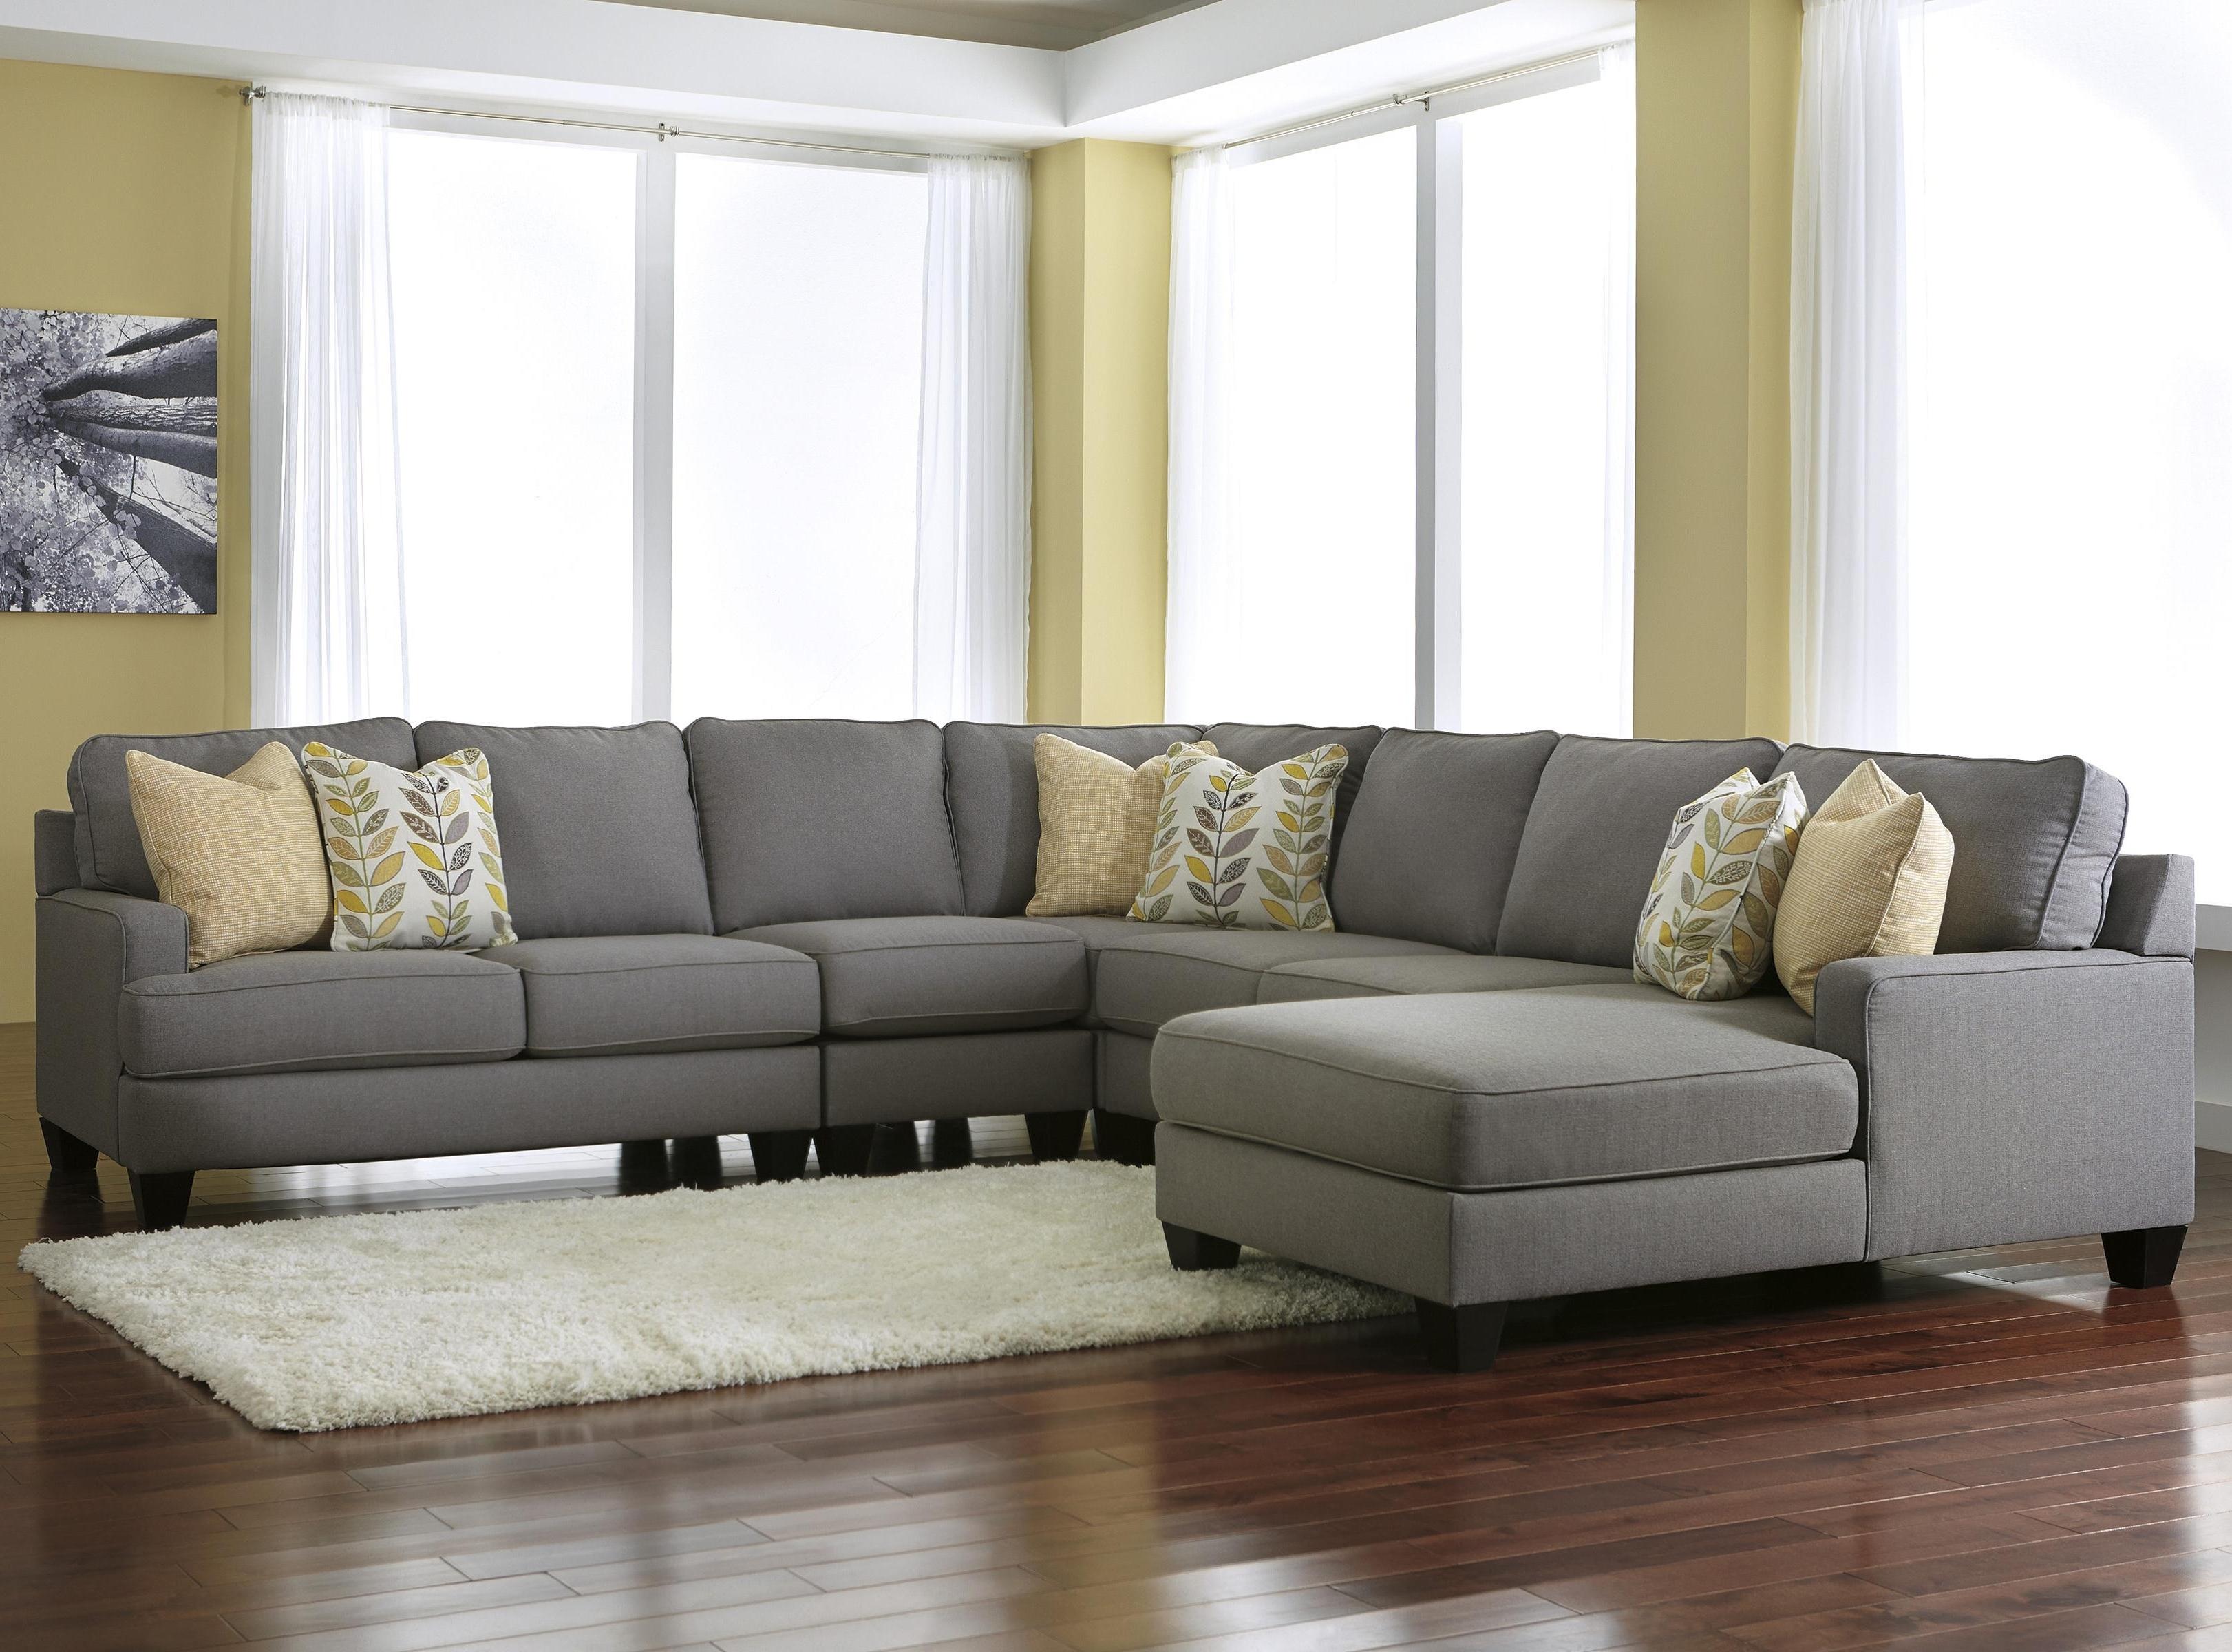 Recent Signature Designashley Chamberly – Alloy Modern 5 Piece For Jonesboro Ar Sectional Sofas (View 3 of 15)